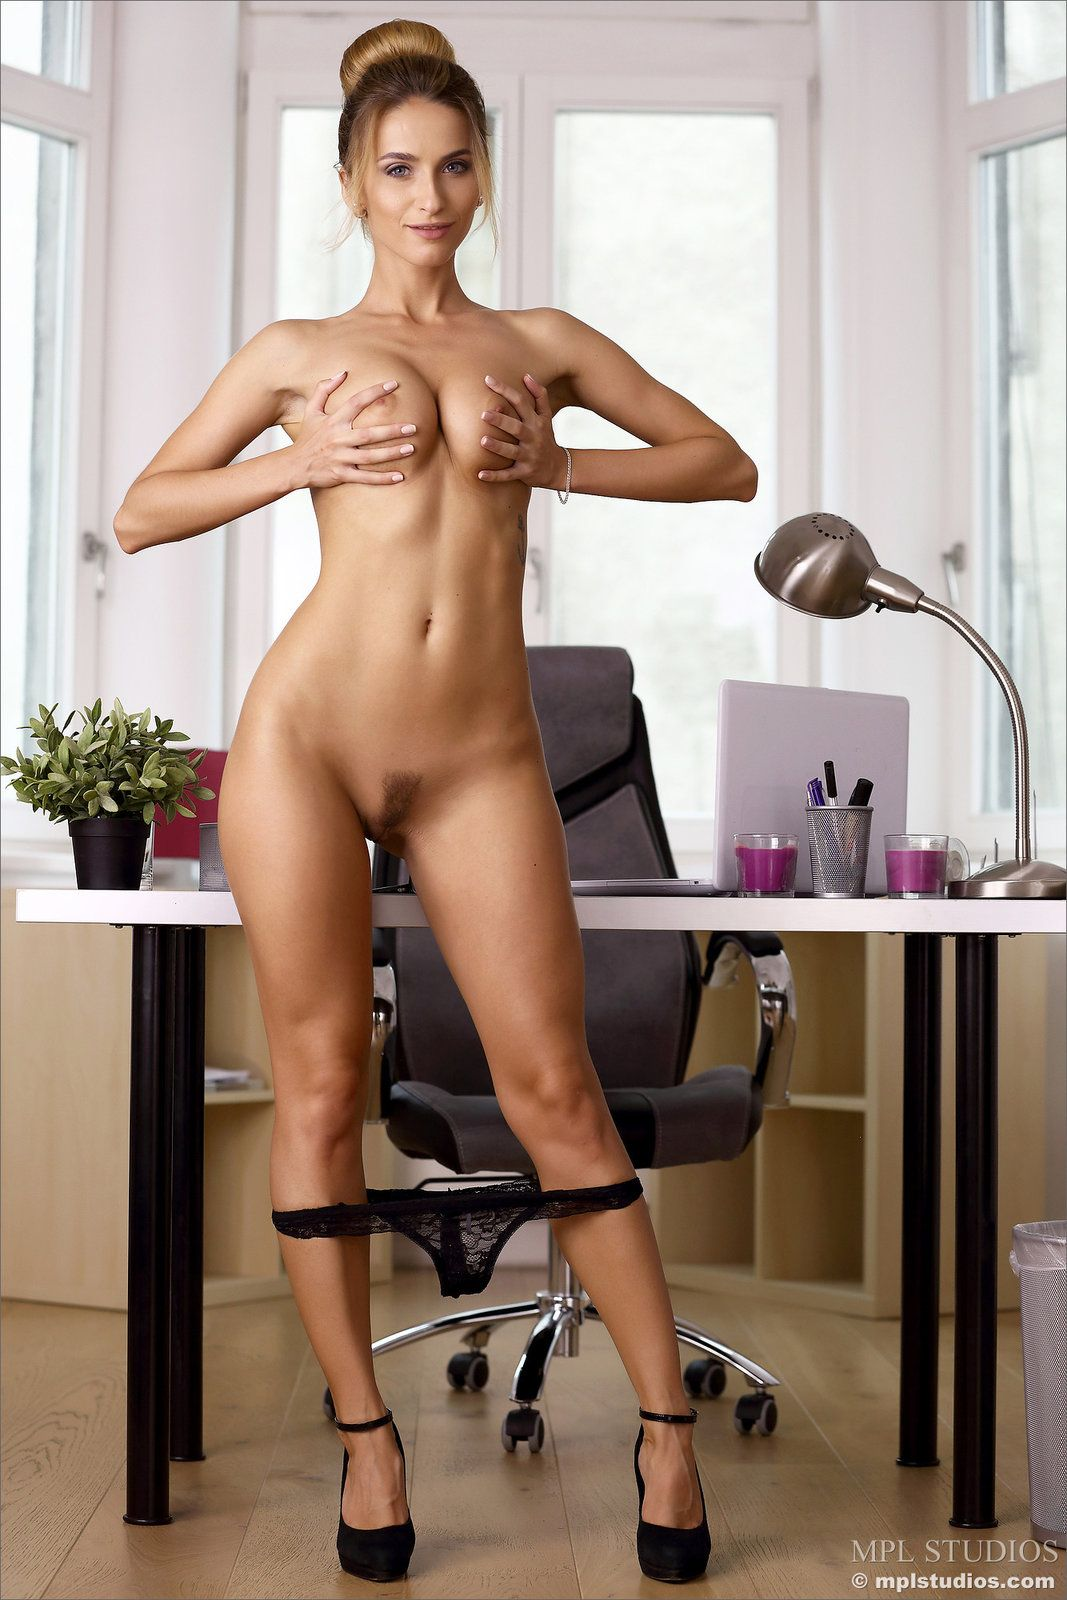 Office Girls Lesbian Hot Legs Milf Porn Chubby Asshole bikini office girls . hot porno. comments: 3